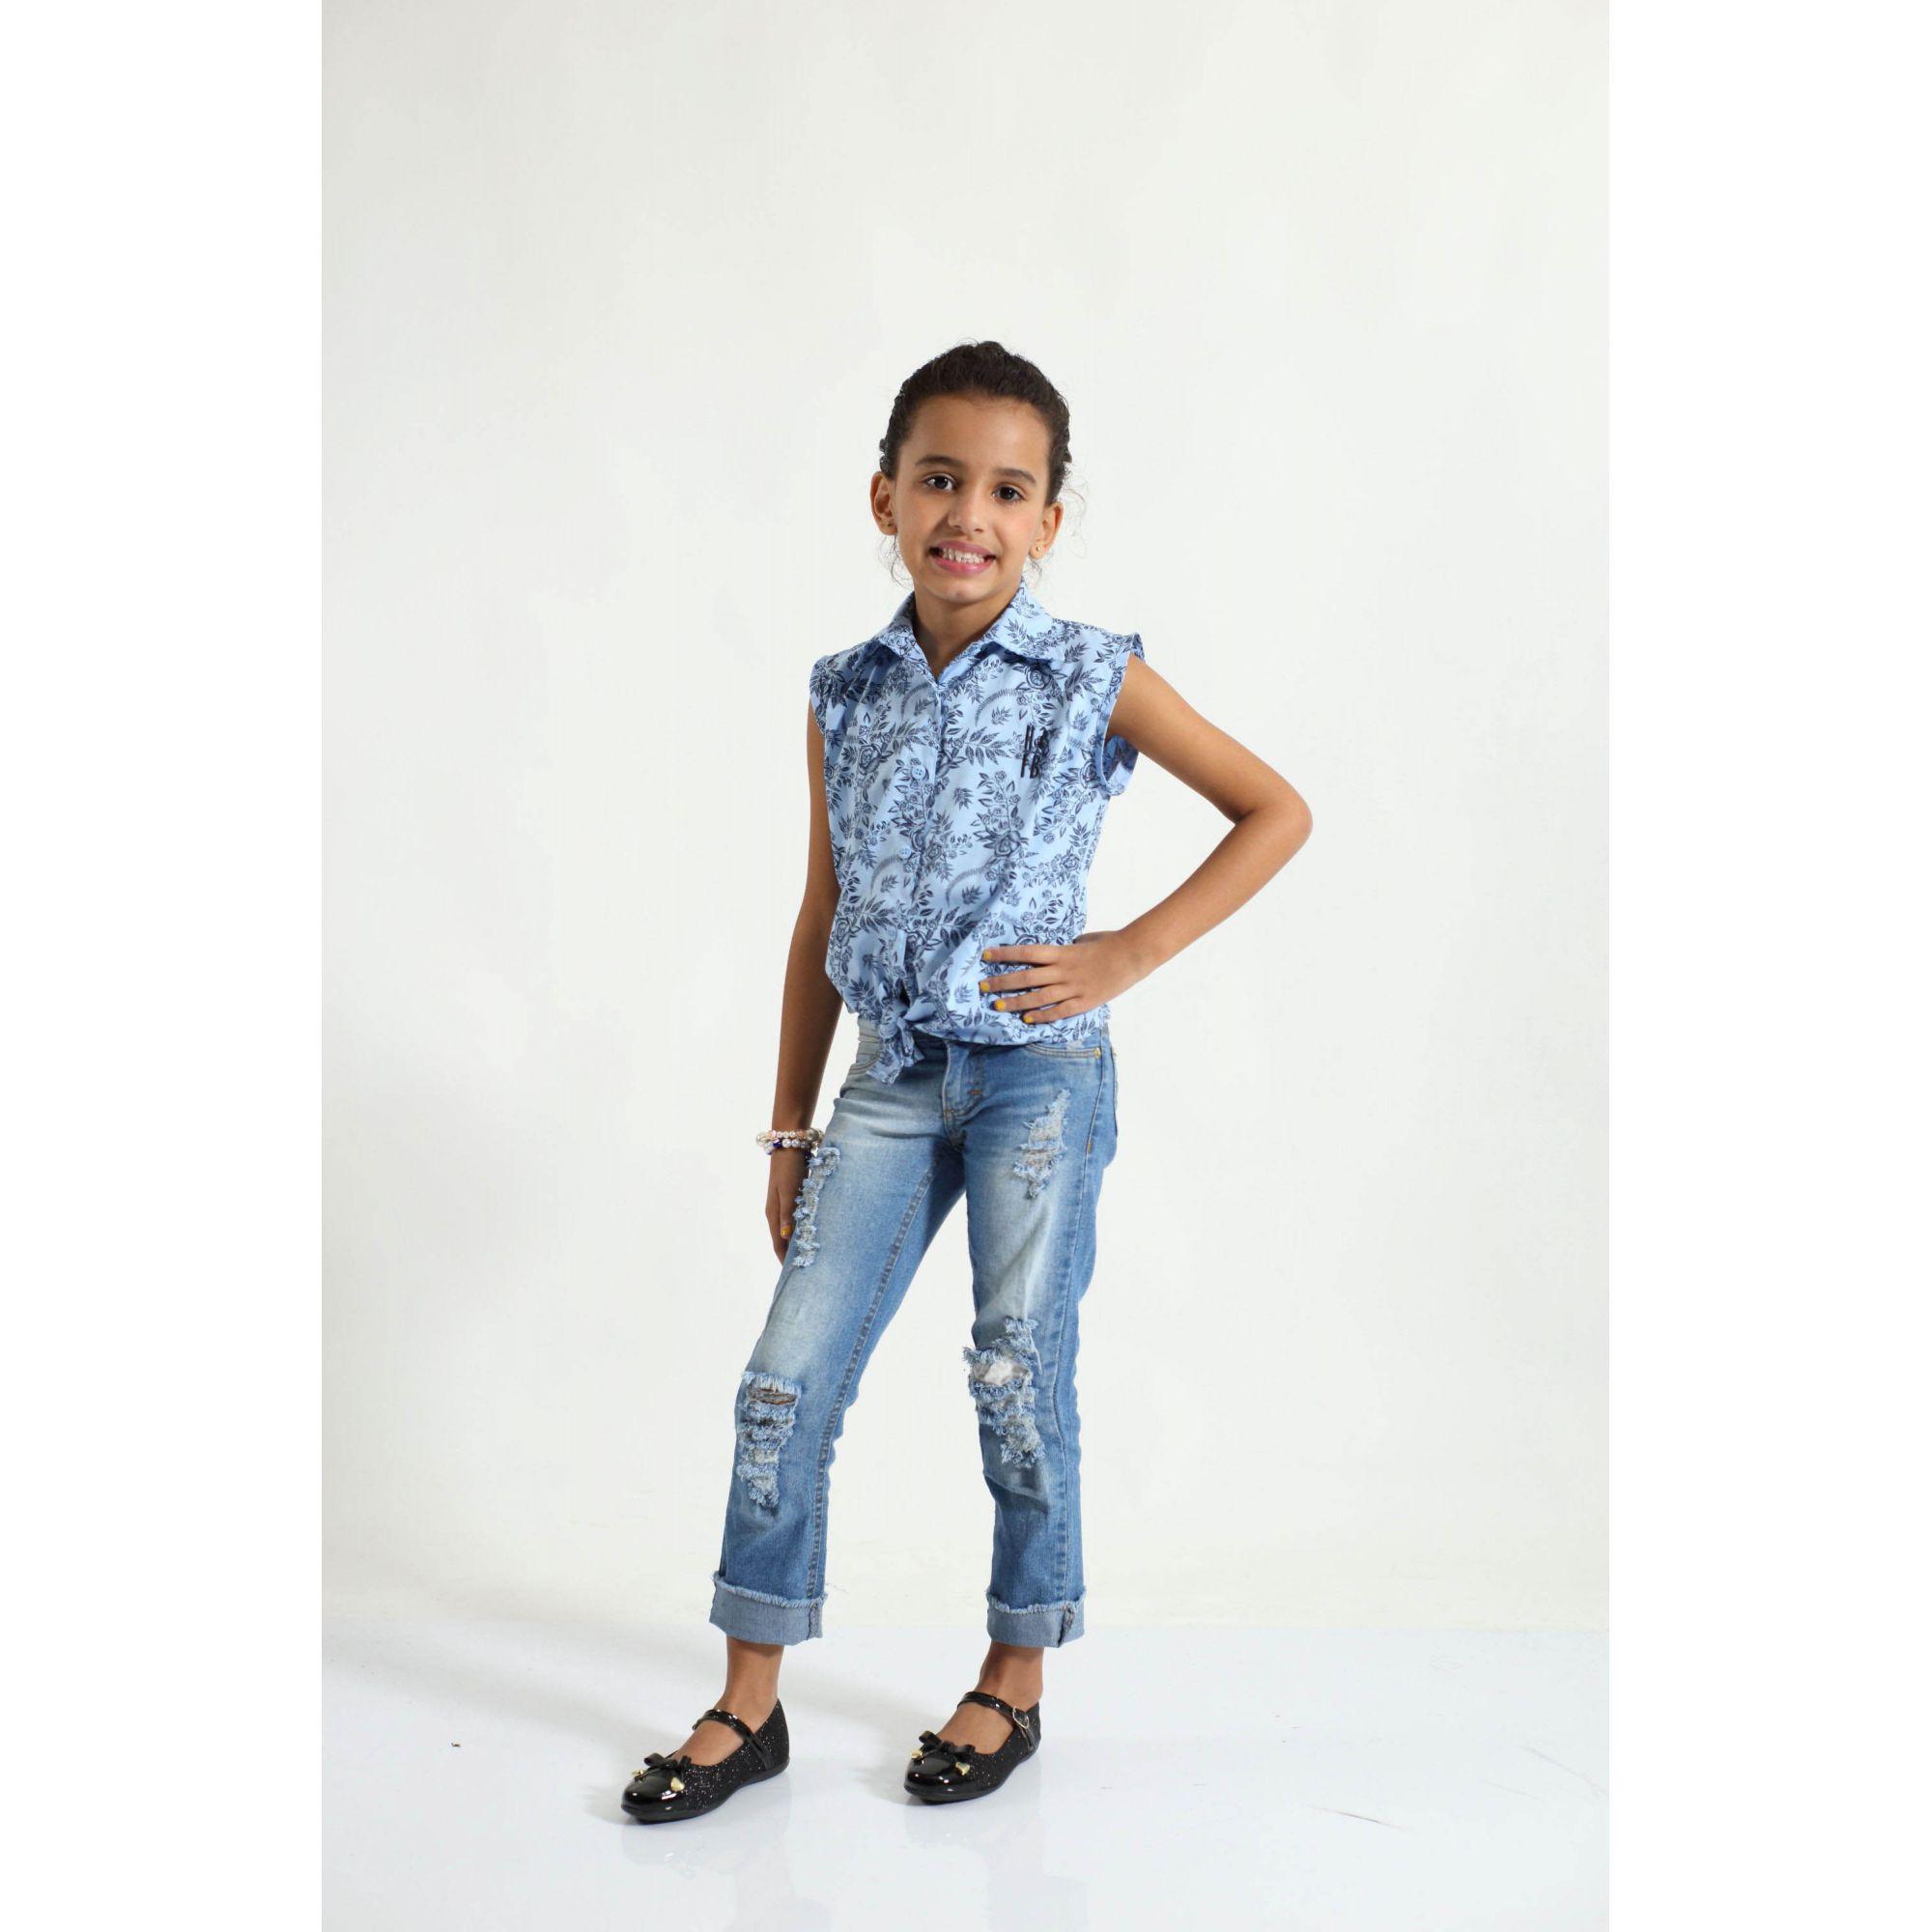 4c1a30ac52856 ... PAI E FILHA > Kit 02 Camisas Manga Curta Azul Floral [Coleção Tal Pai  Tal